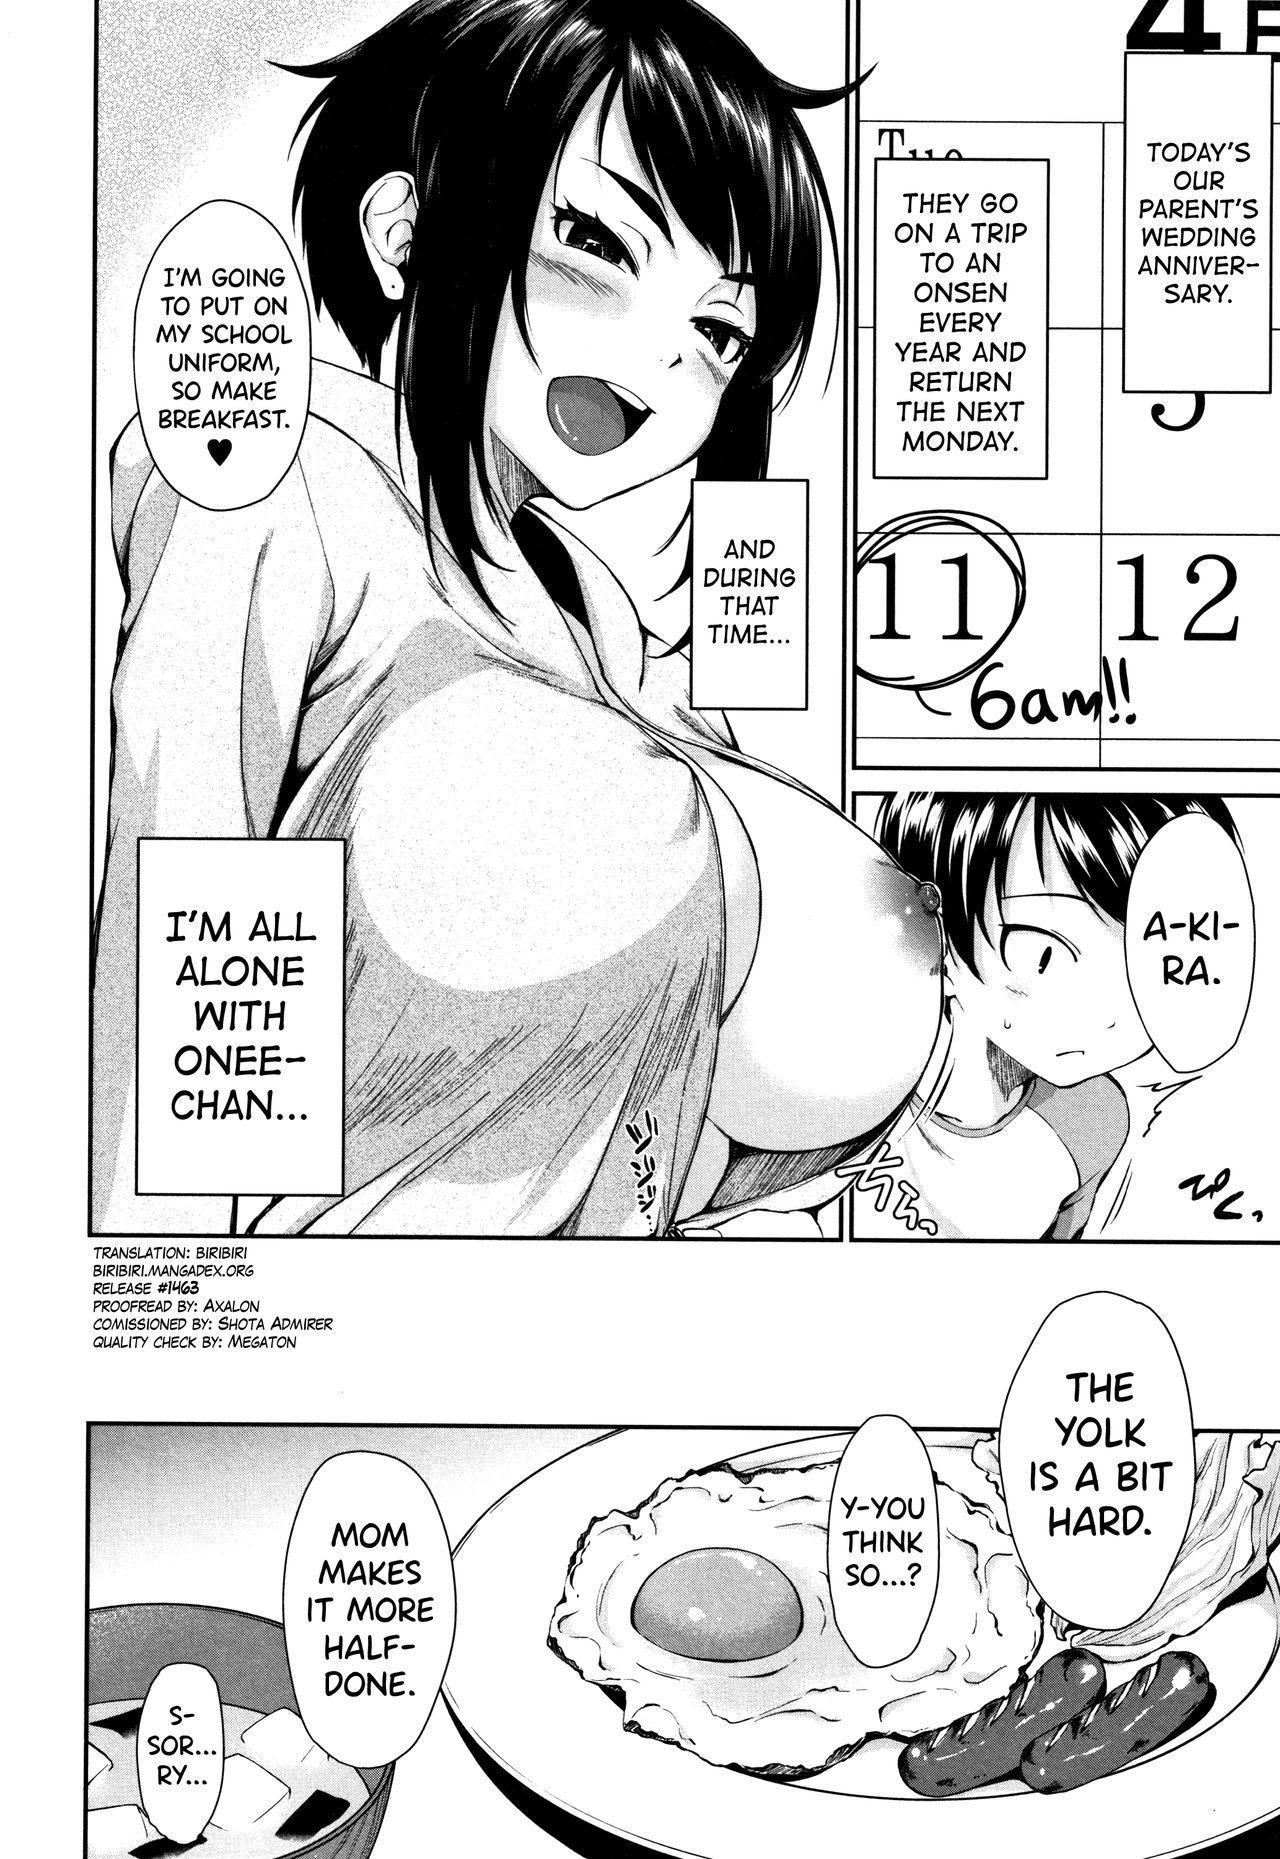 [Kurokura Eri] Onee-chan to Issho! Ch.1-4 [English] [biribiri] 39